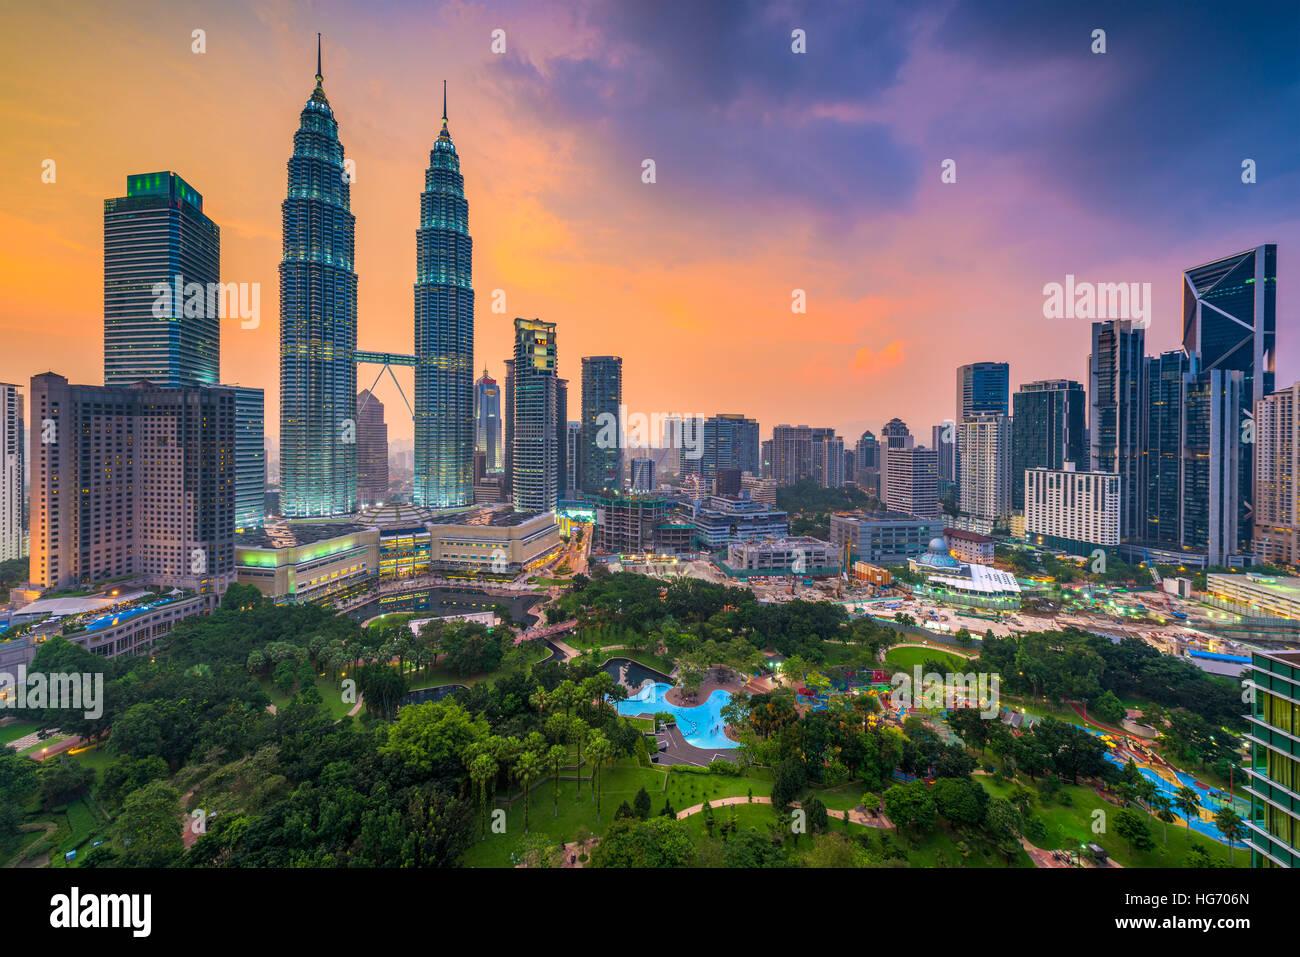 Kuala Lumpur, Malasia skyline al atardecer sobre el parque. Imagen De Stock